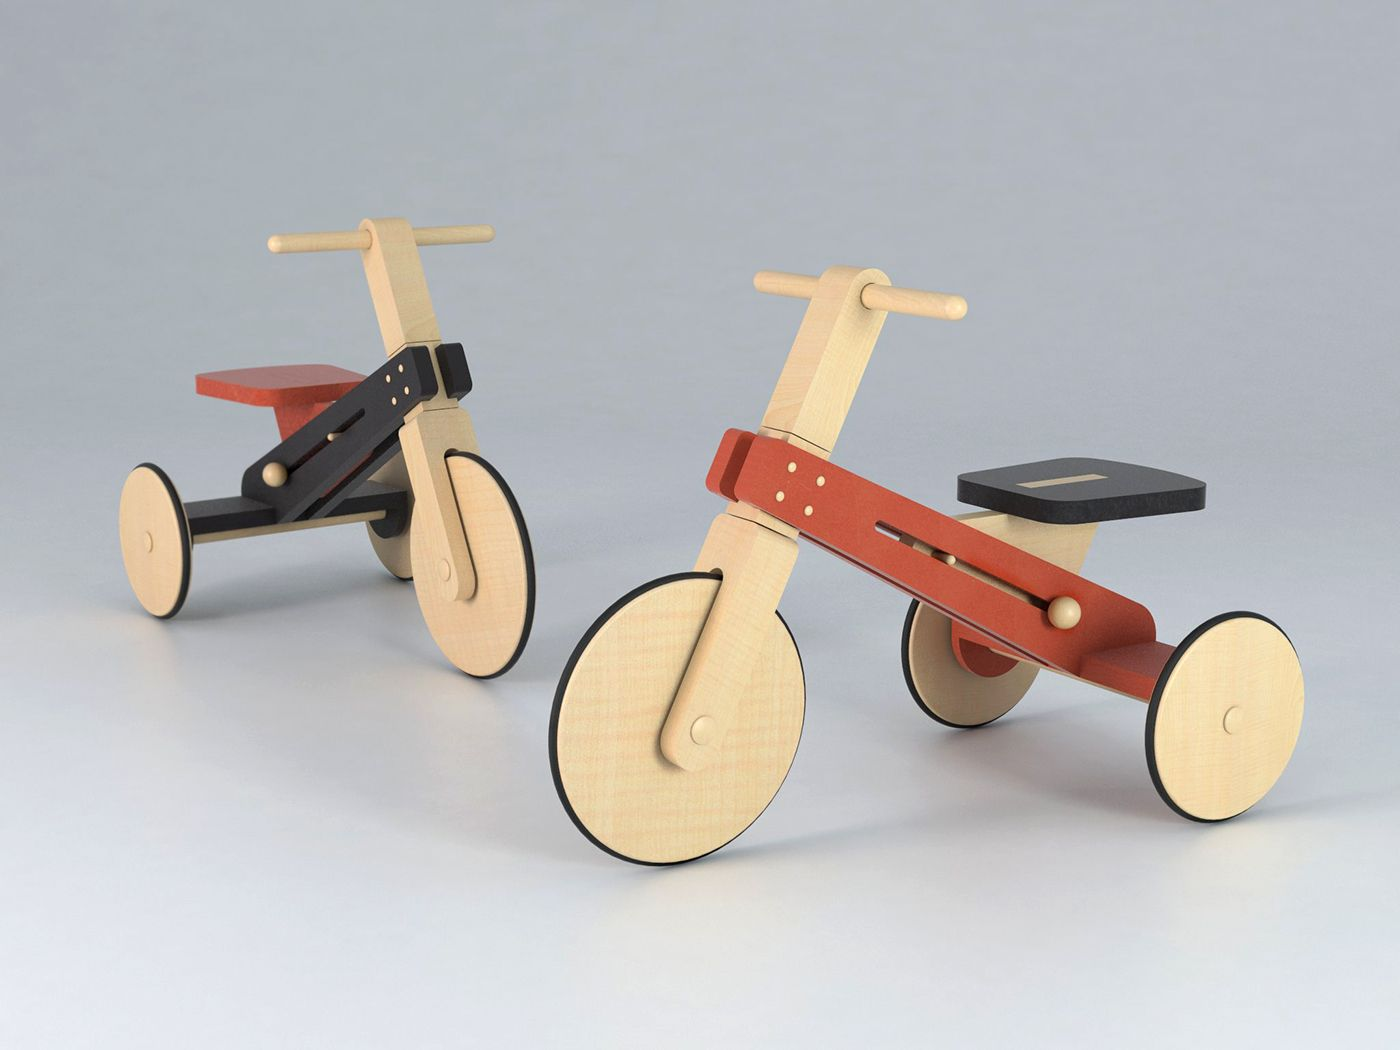 tricycle.2 on behance   Изделия из дерева   toys, wooden